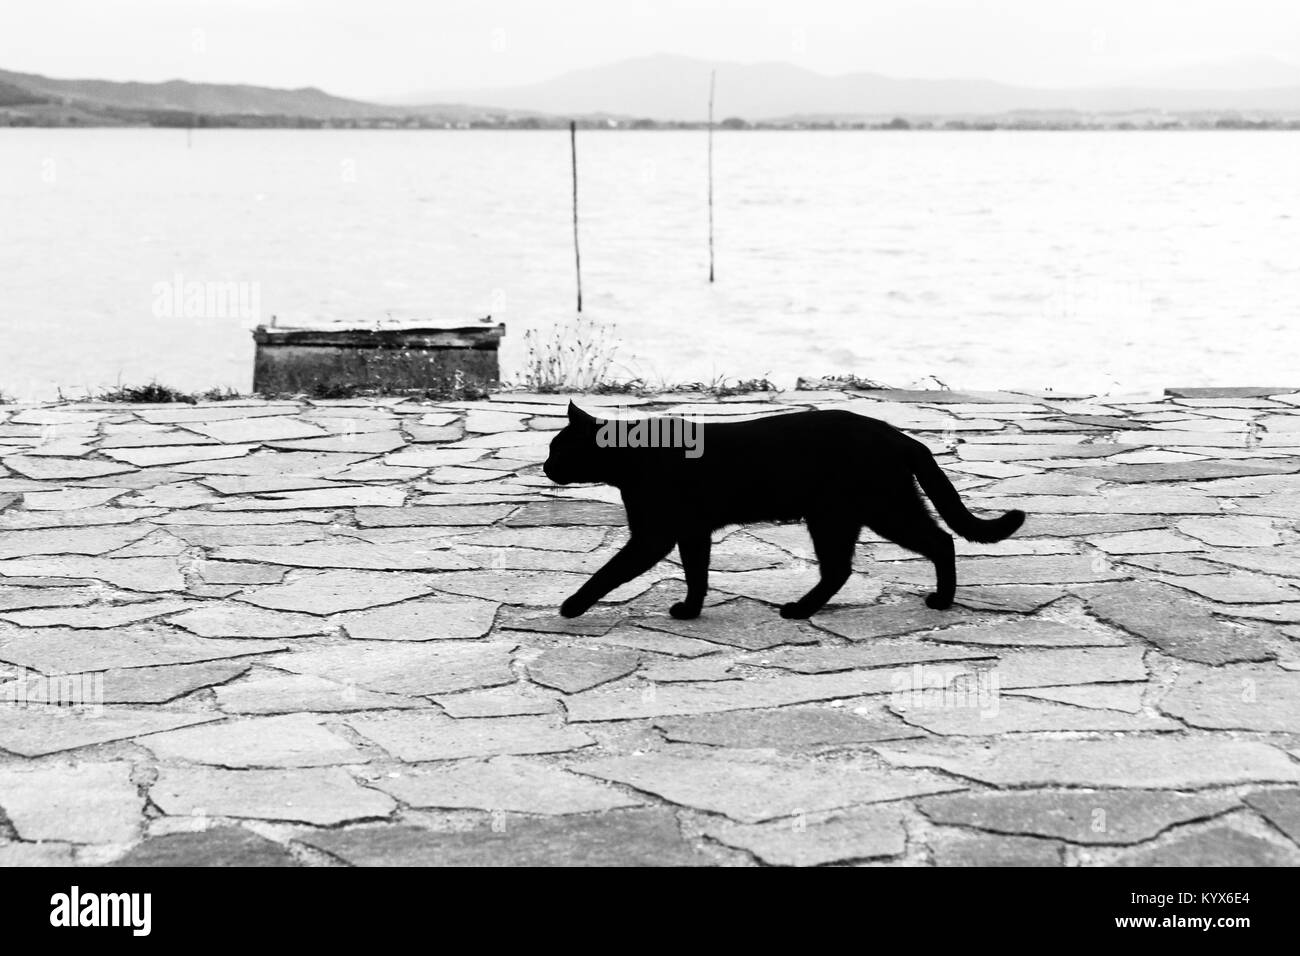 A black cat walking on a pier on Trasimeno lake (Umbria) - Stock Image